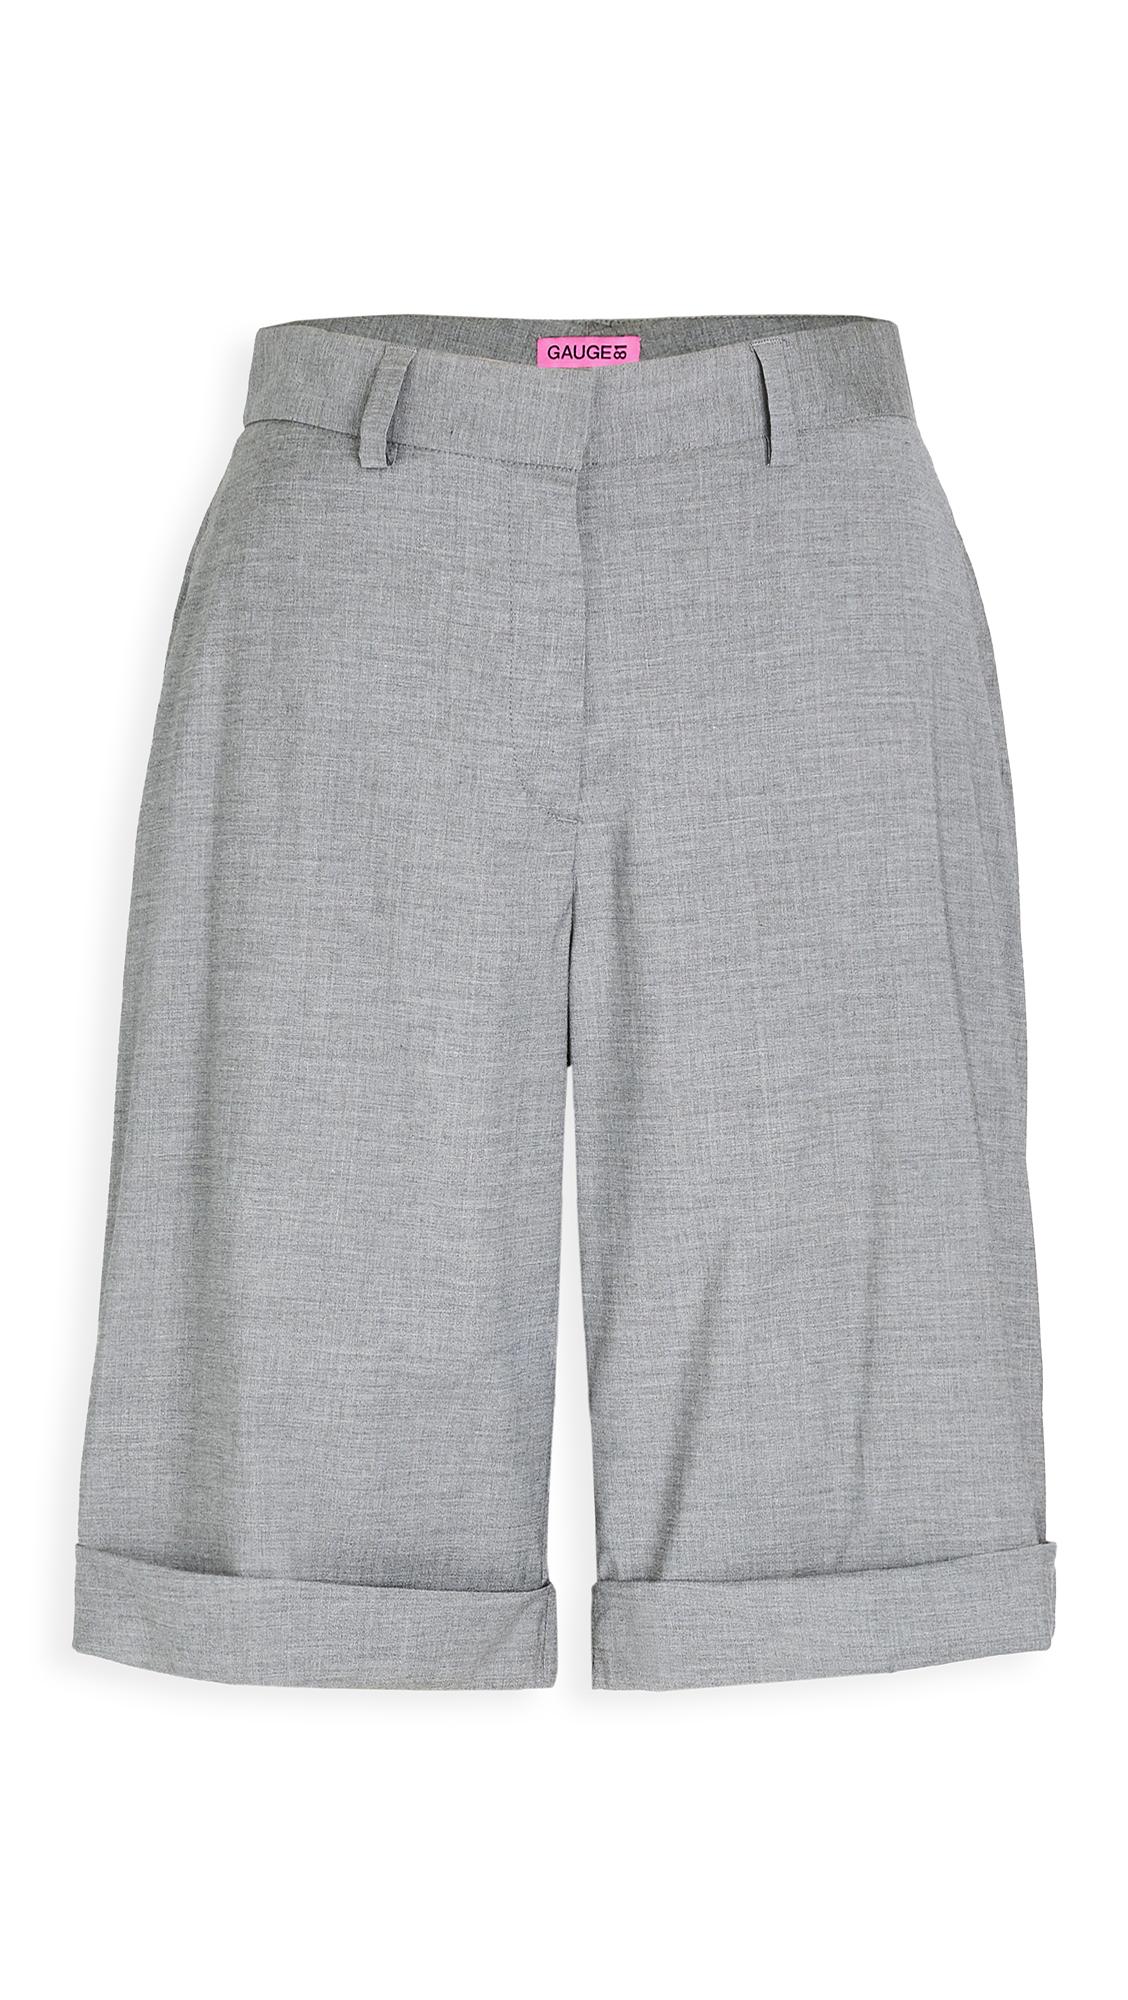 GAUGE81 Aruba Shorts